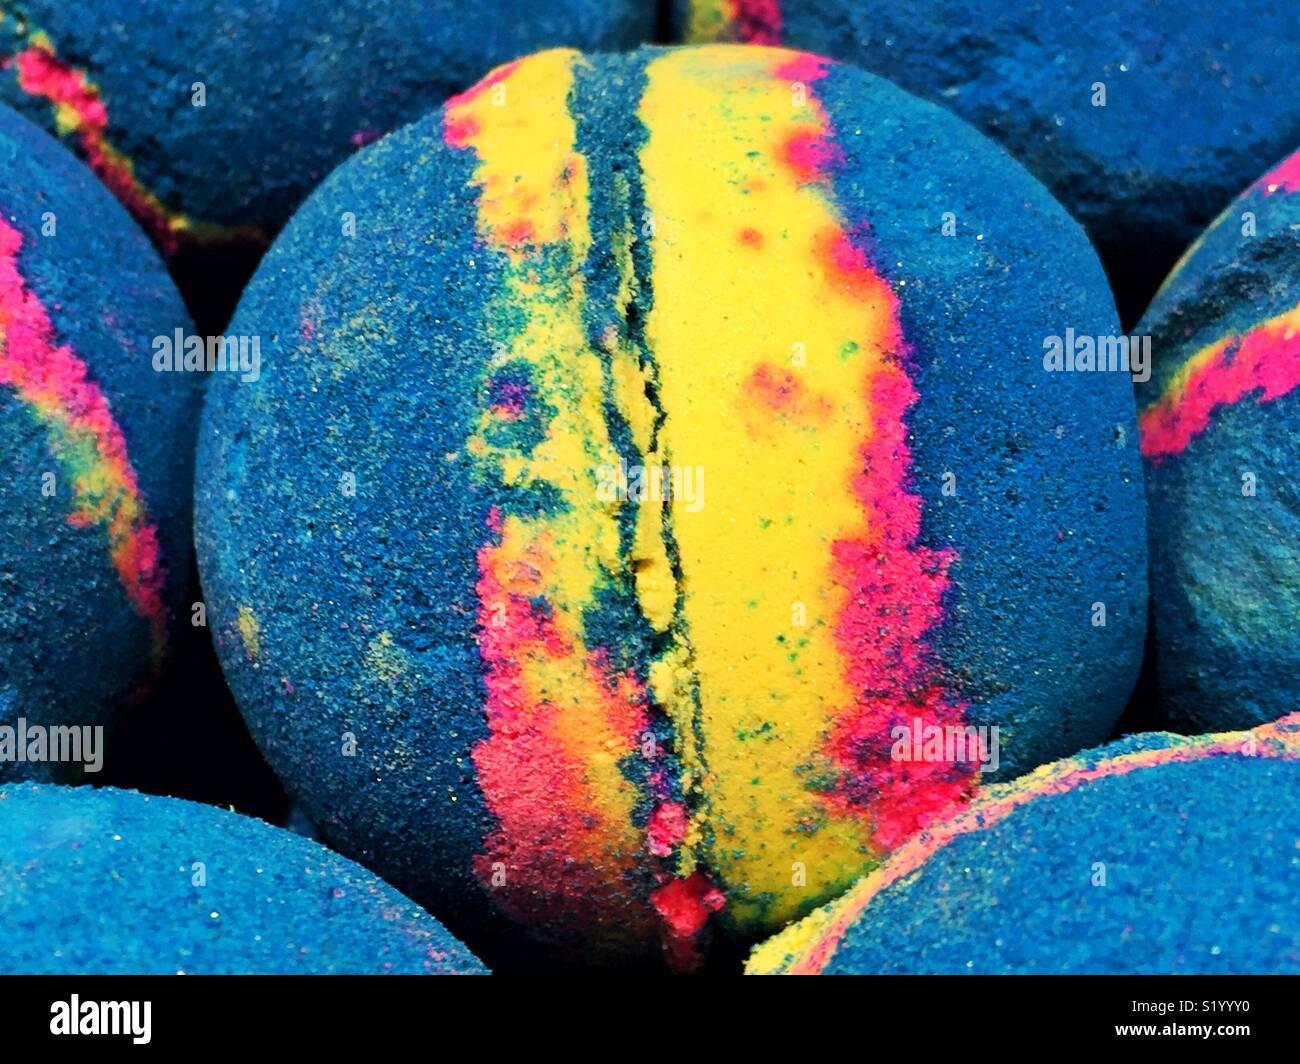 Neon colors on spherical bath bomb - Stock Image